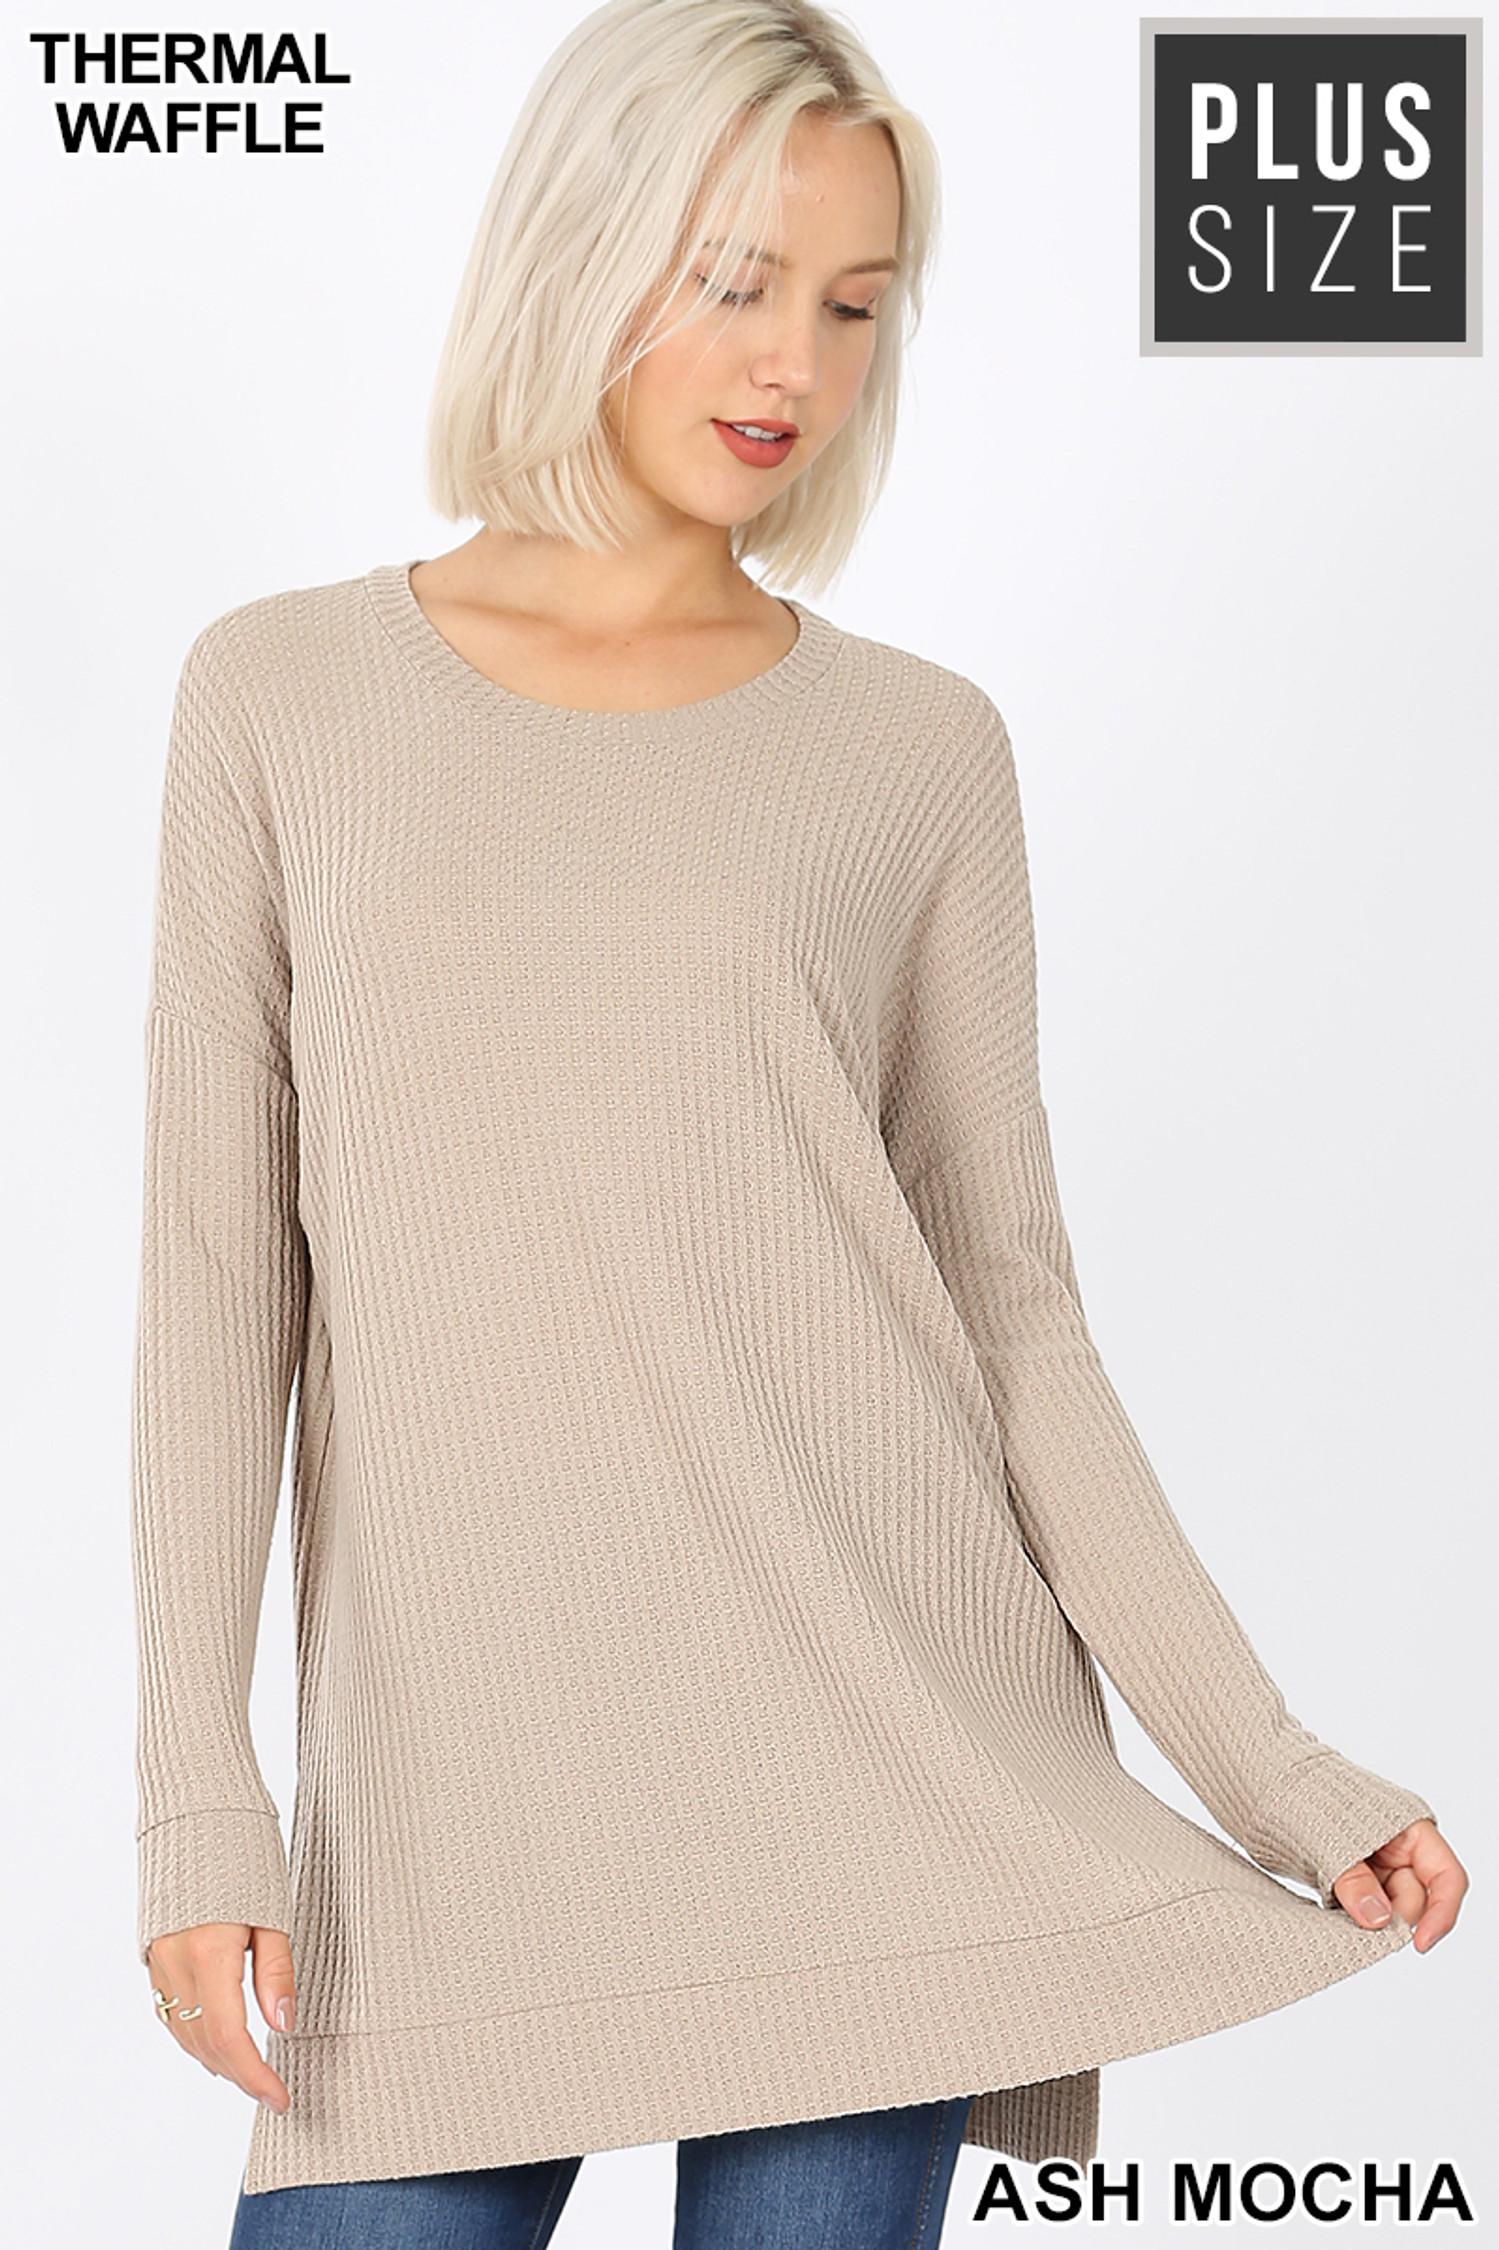 Front image of Ash Mocha Brushed Thermal Waffle Knit Round Neck Plus Size Sweater